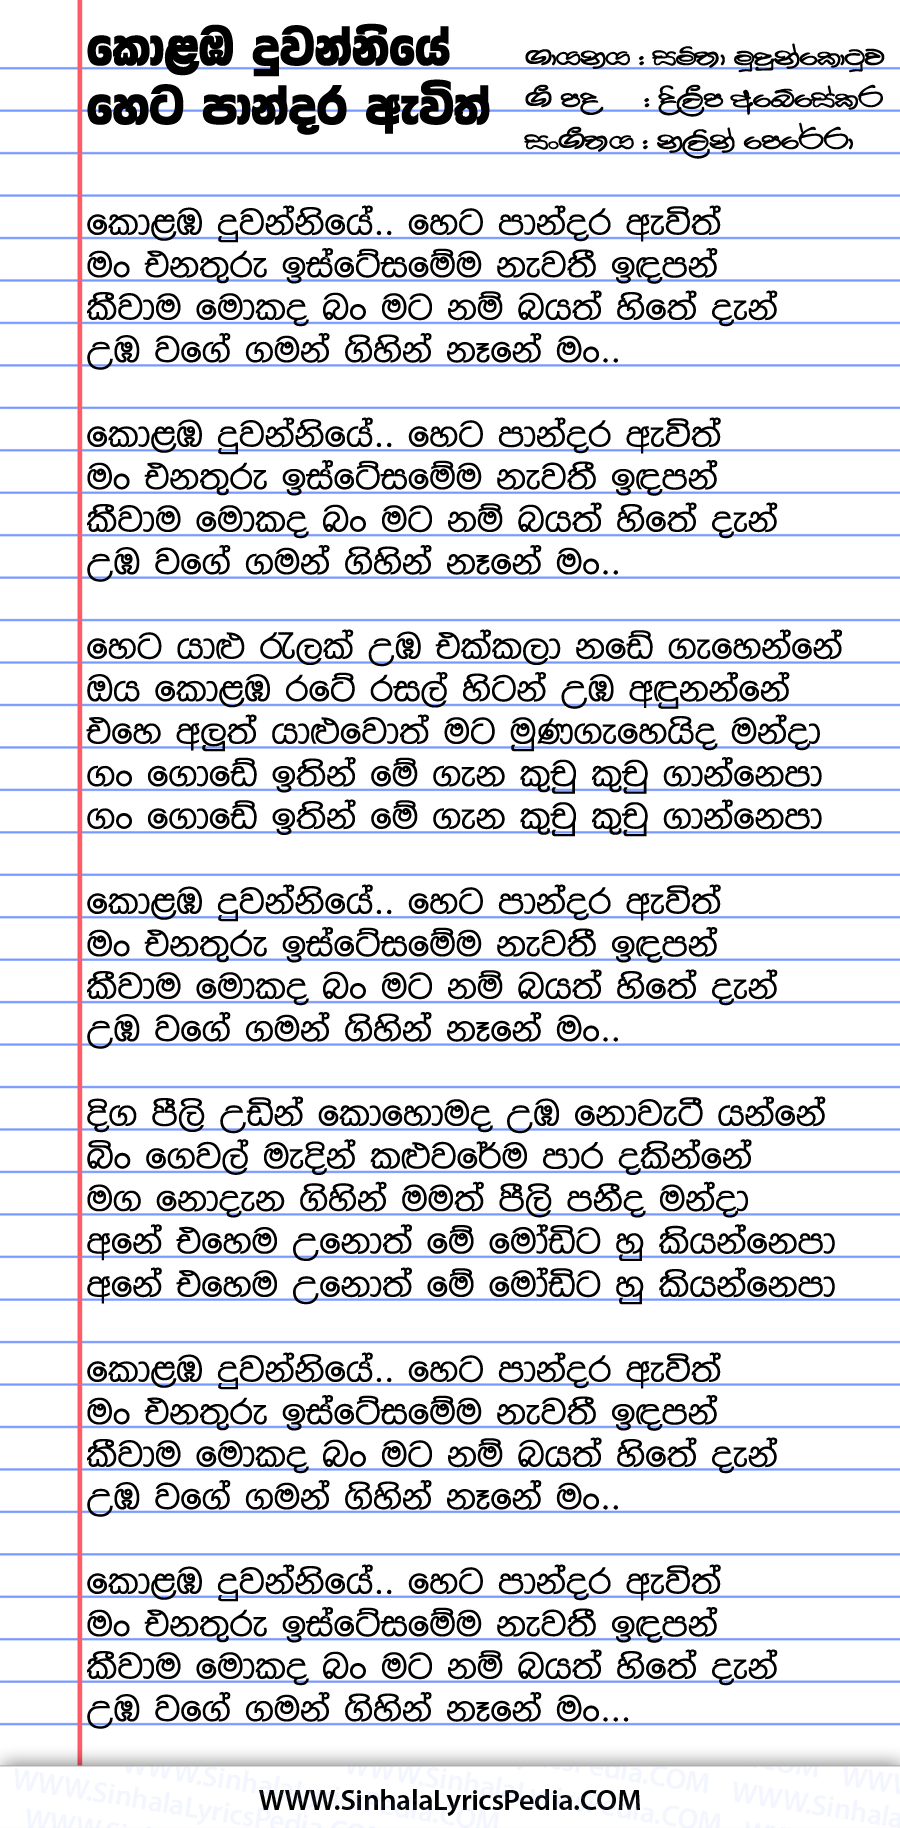 Kolamba Duwanniye Song Lyrics